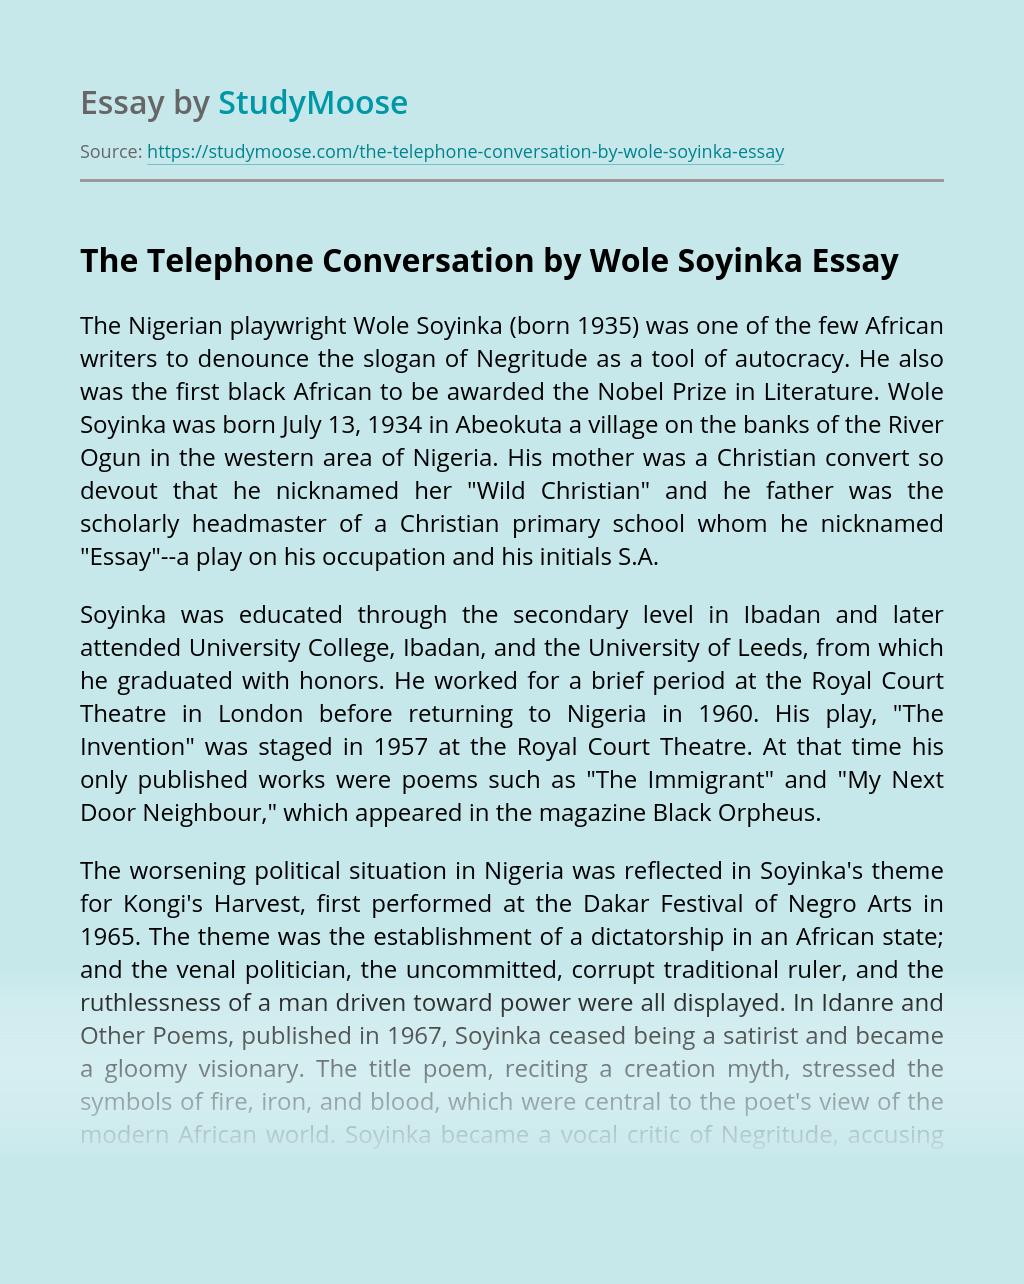 The Telephone Conversation by Wole Soyinka